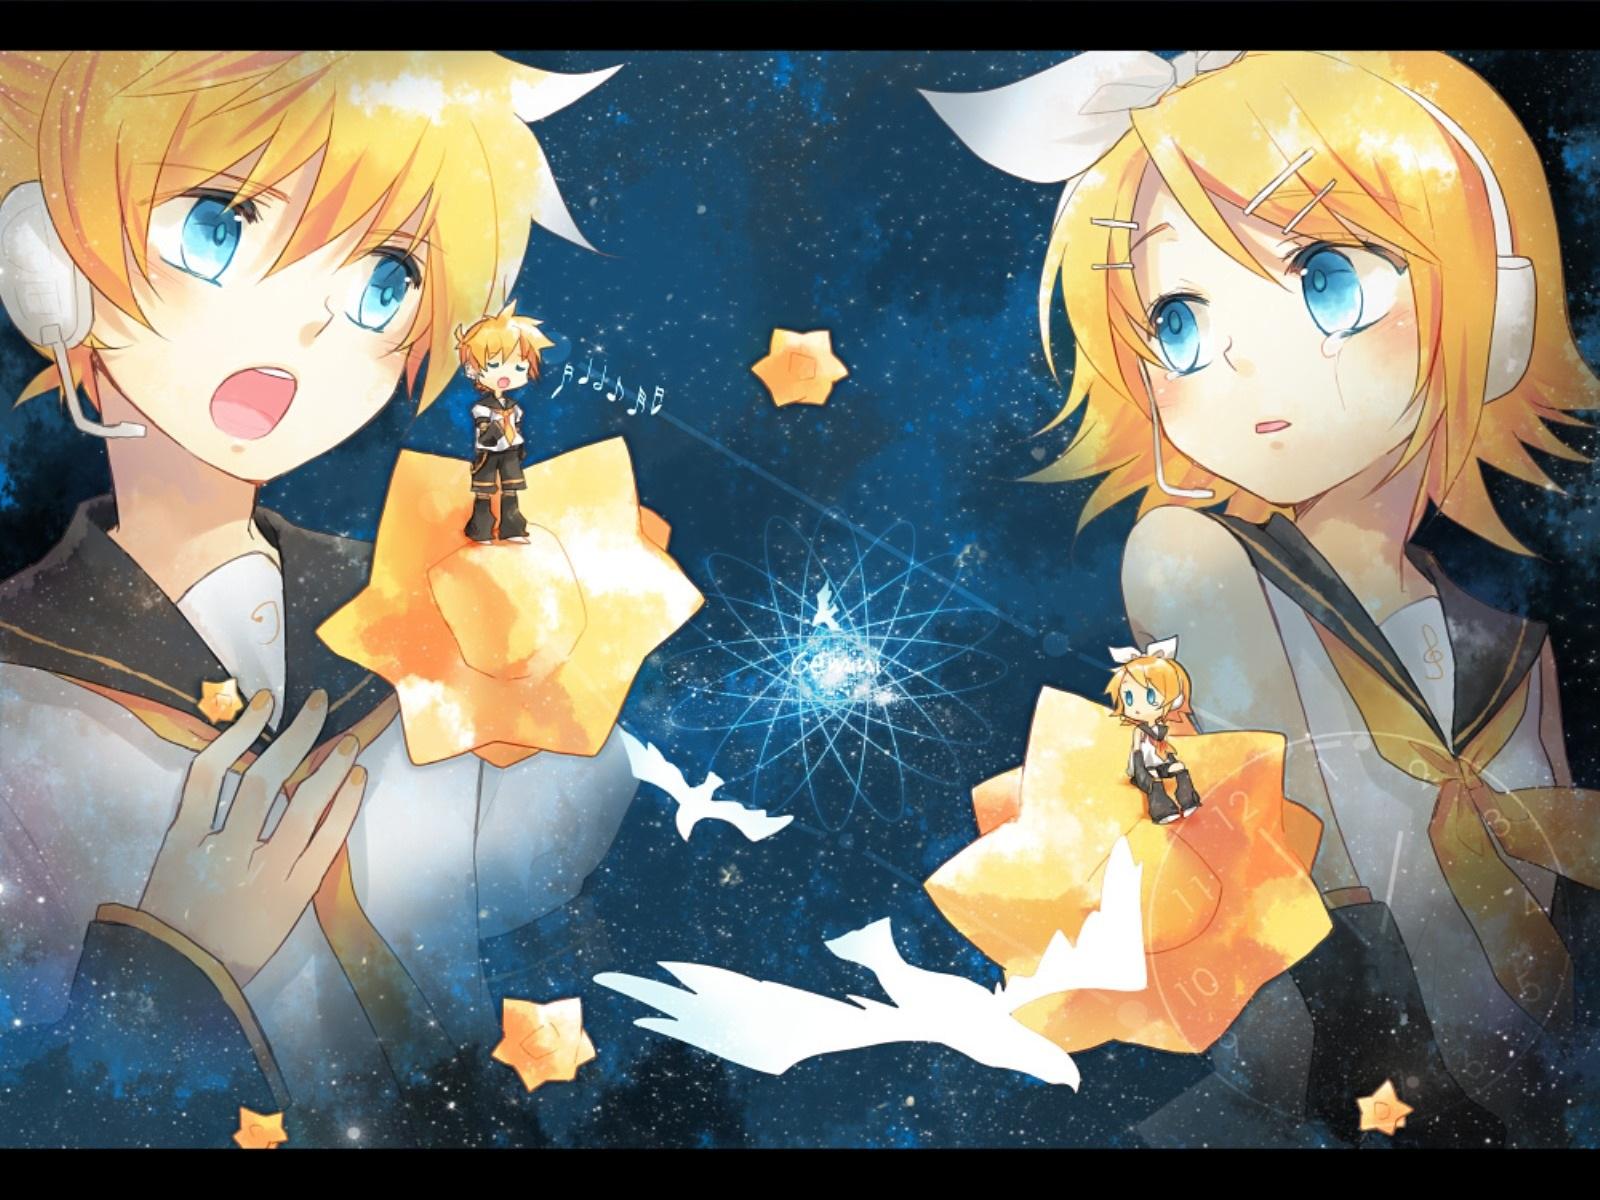 blonde_hair blue_eyes chibi headphones kagamine_len kagamine_rin male renta_(deja-vu) short_hair shorts space stars tears vocaloid